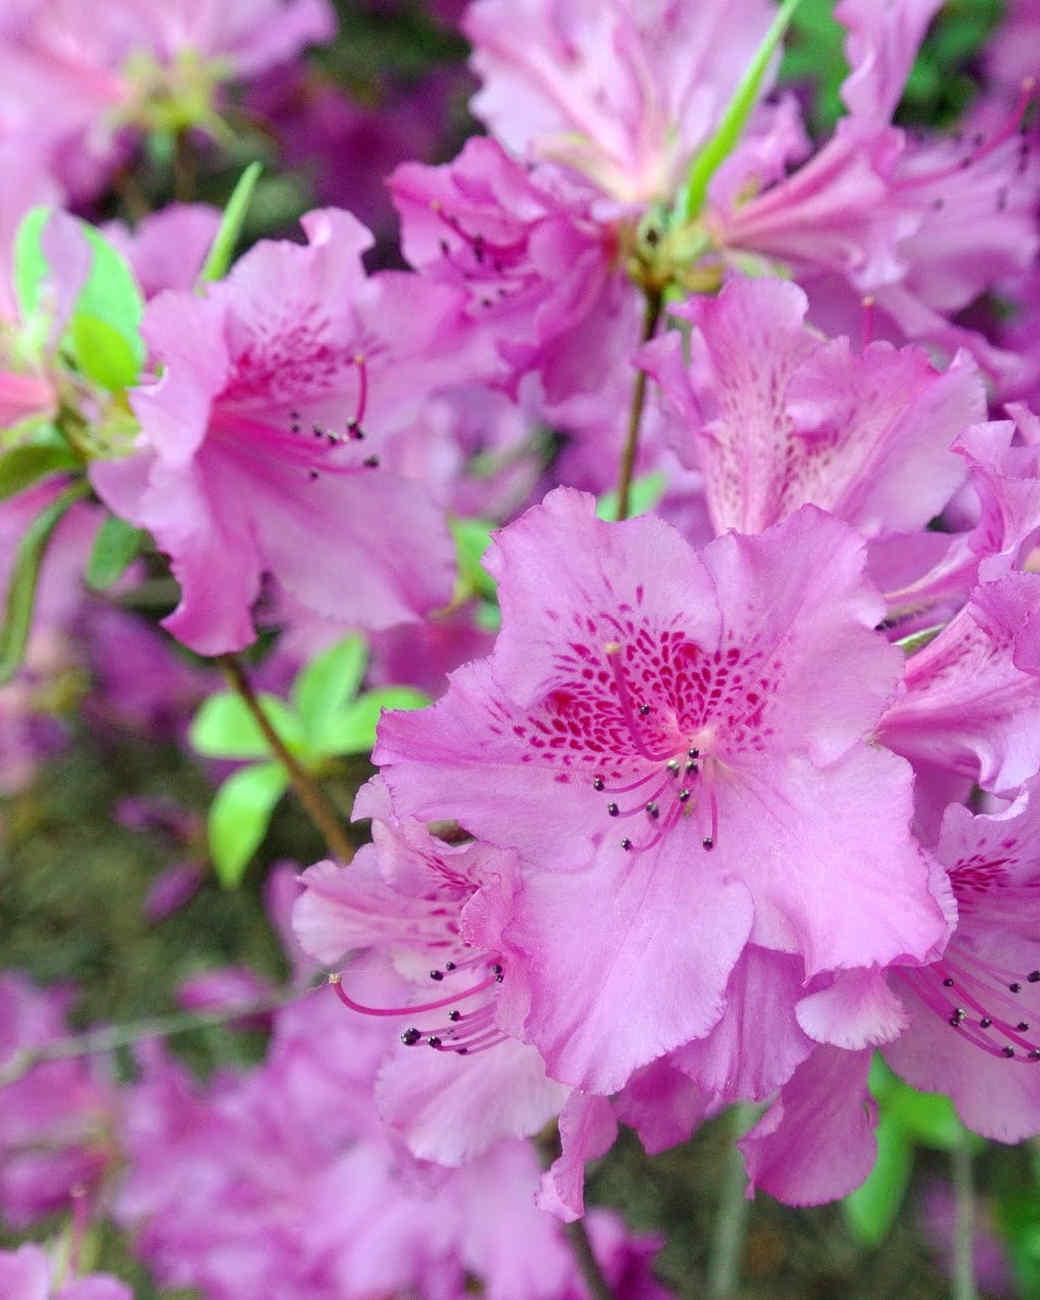 azaleas-liliacs-blog20-051515.jpg.jpg